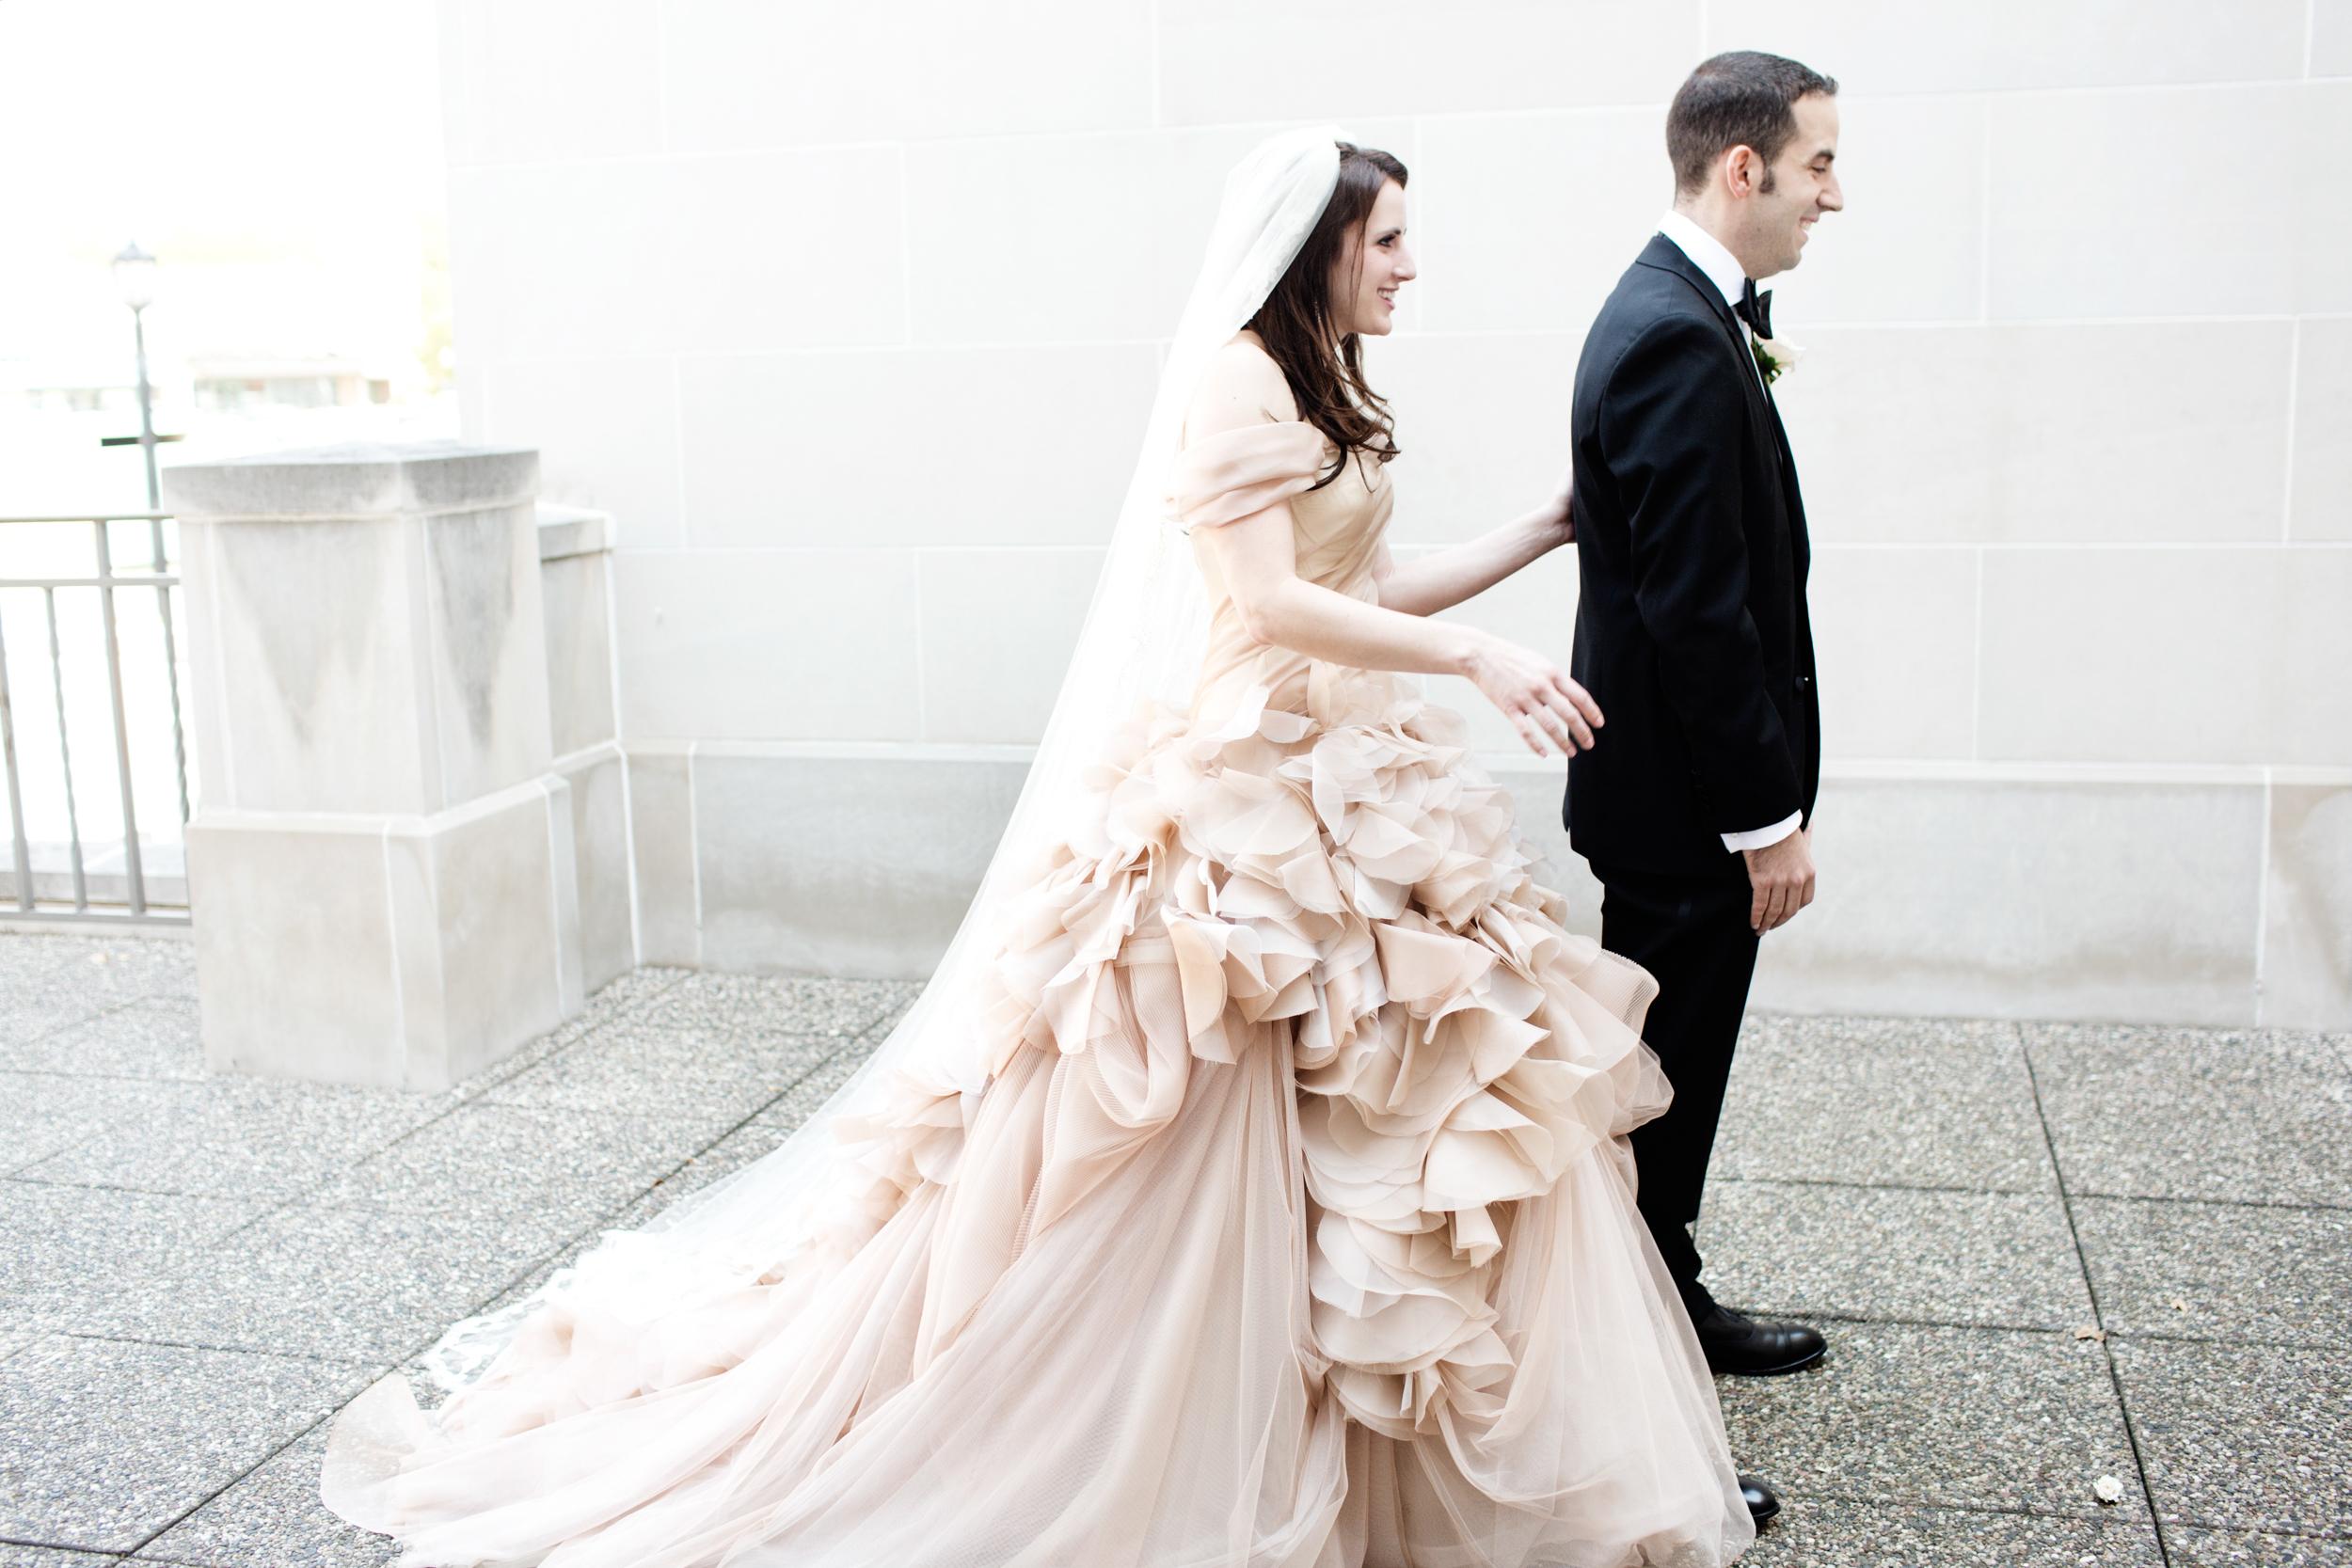 Ceci_New_York_Ceci_Style_Ceci_Johnson_Luxury_Lifestyle_Floral_Lace_Wedding_Letterpress_Inspiration_Design_Custom_Couture_Personalized_Invitations_-120.jpg